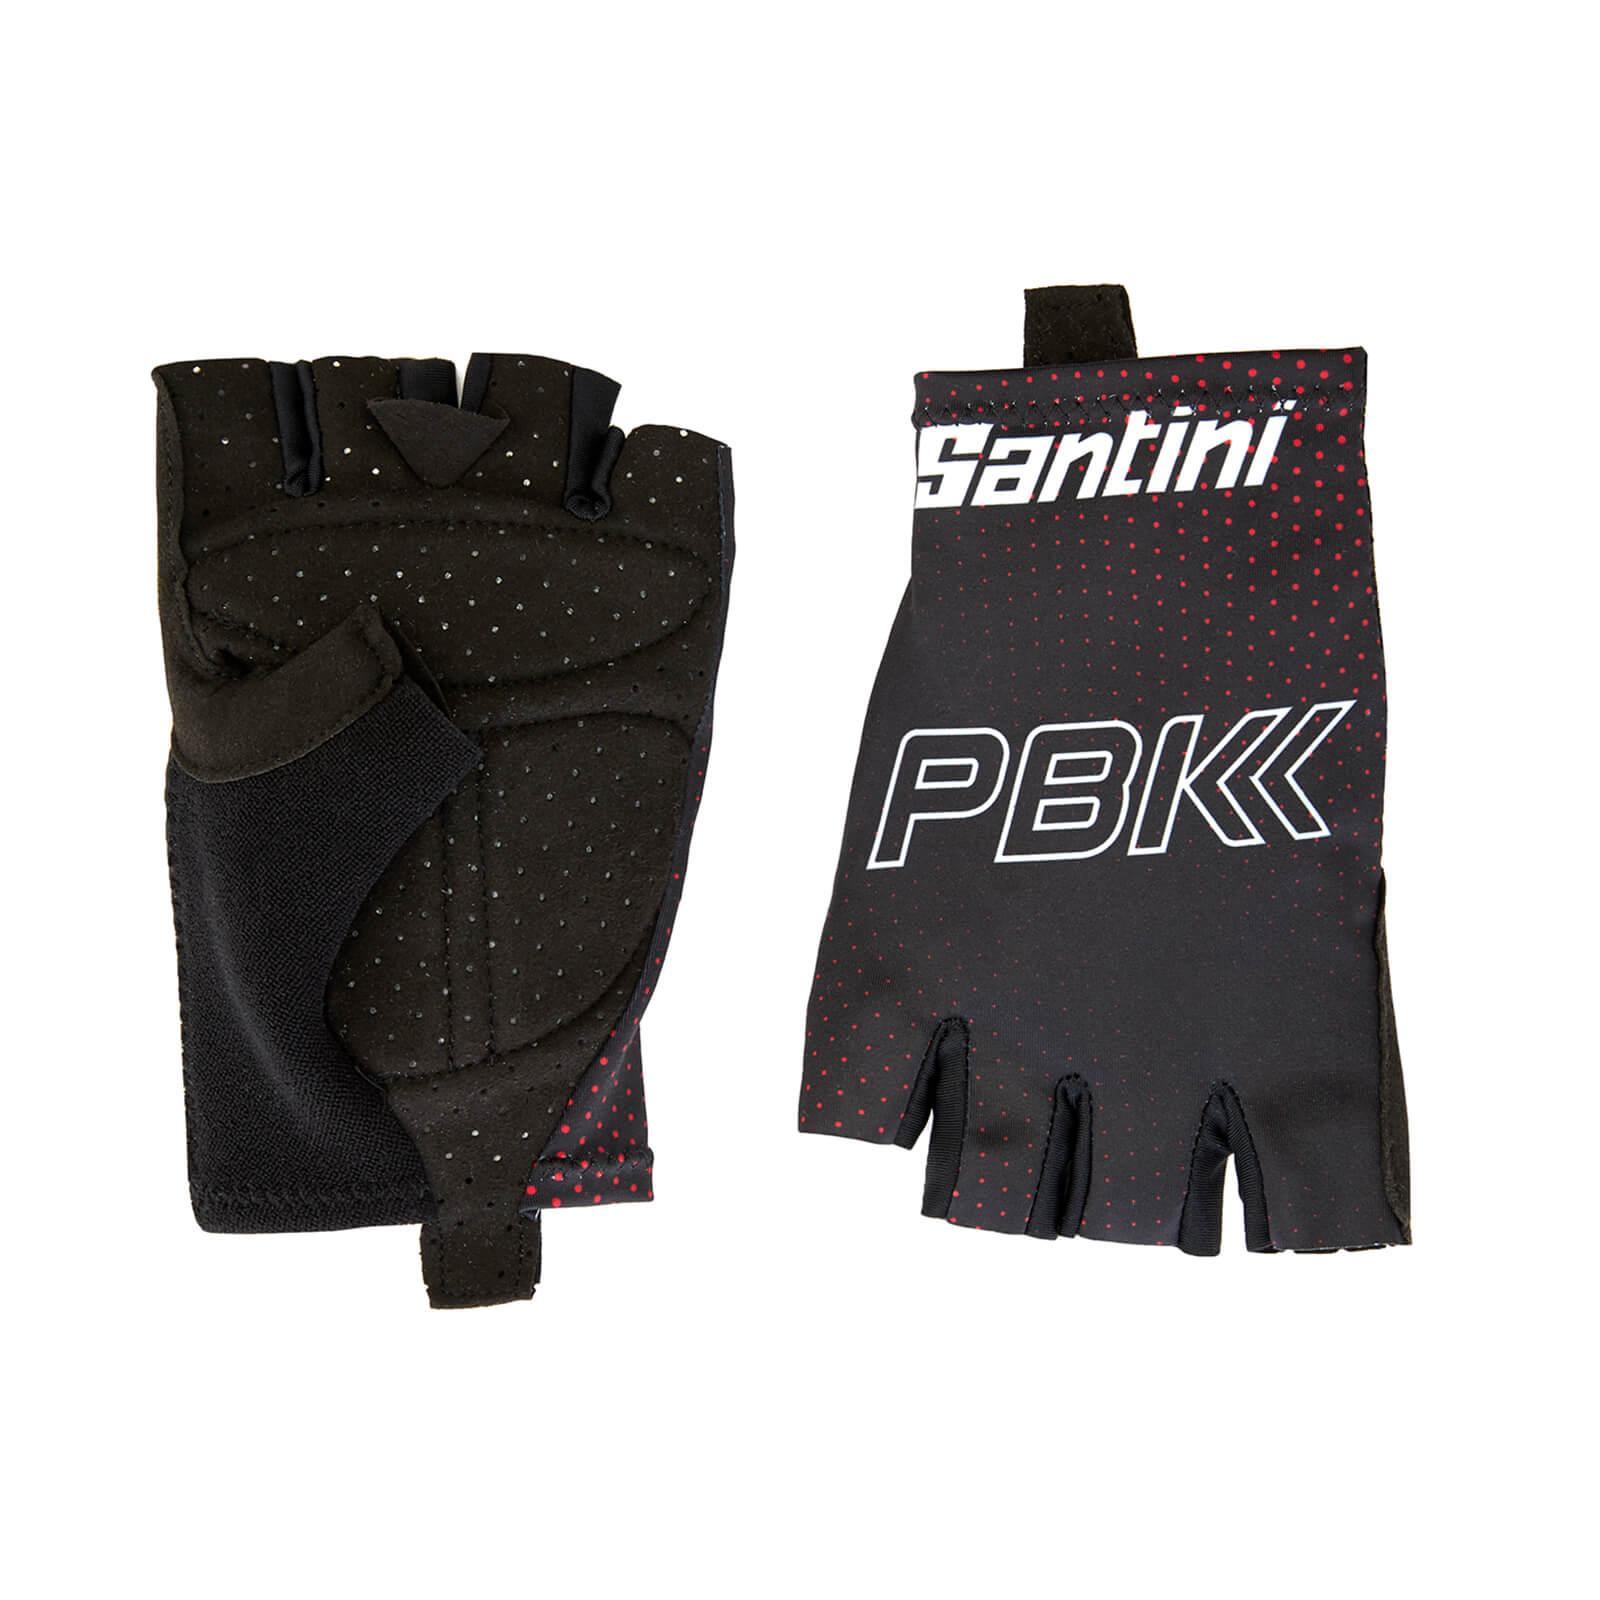 Santini PBK Santini 19 Race Gloves - Black/Red - XL